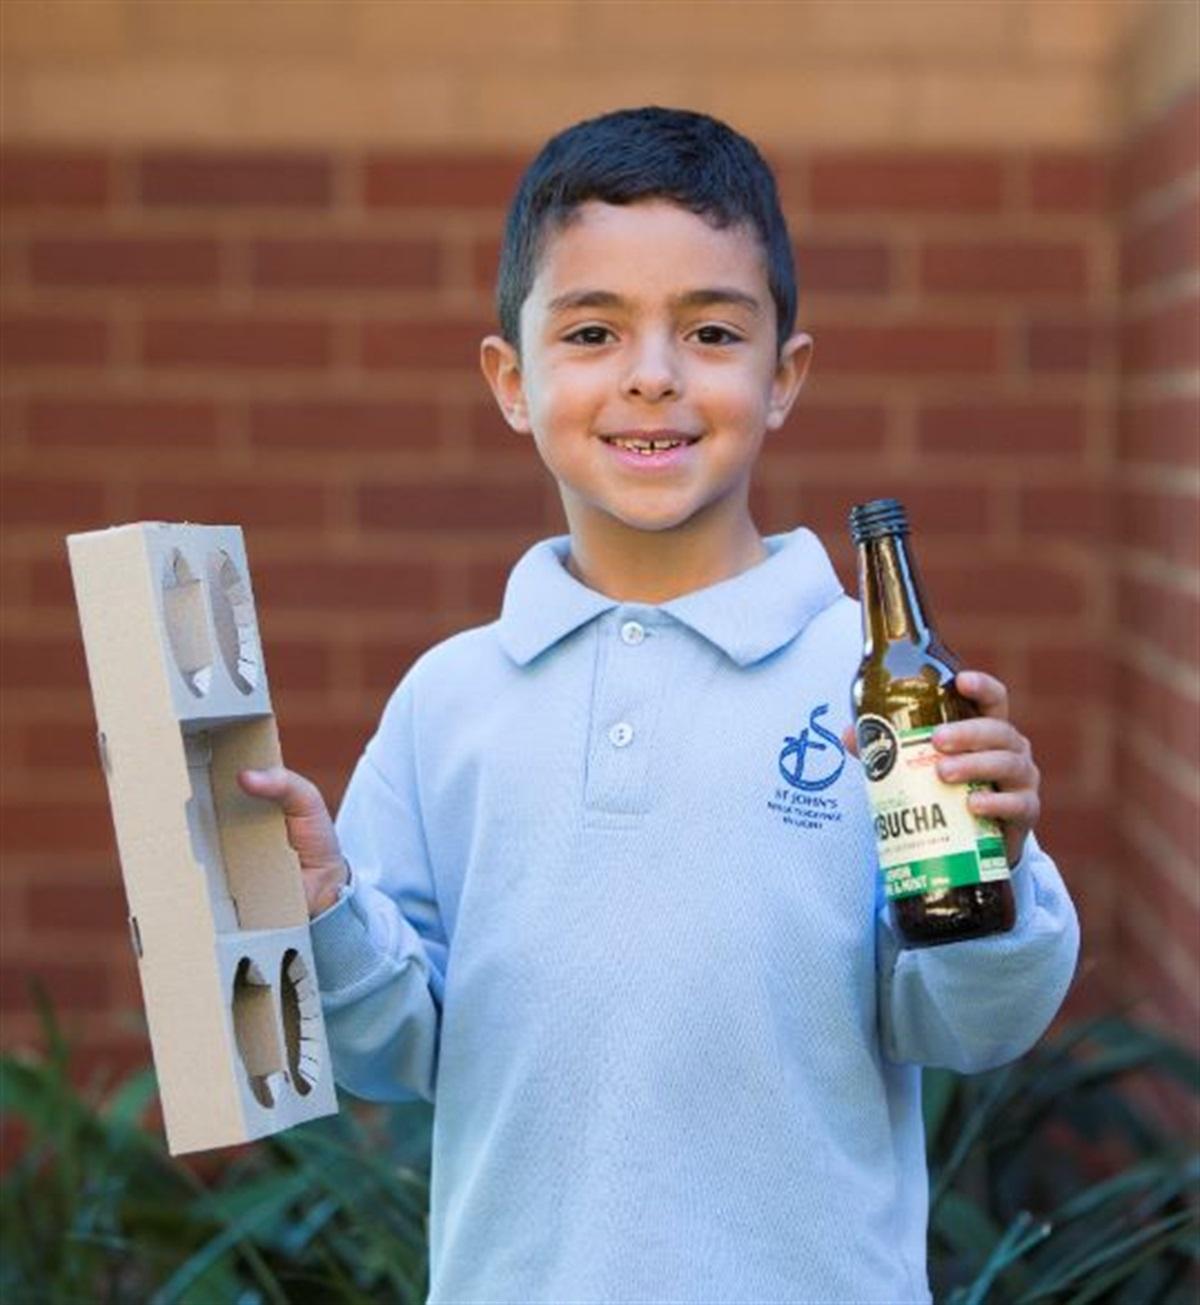 Maribyrnong Victoria: Environmental Programs For Schools